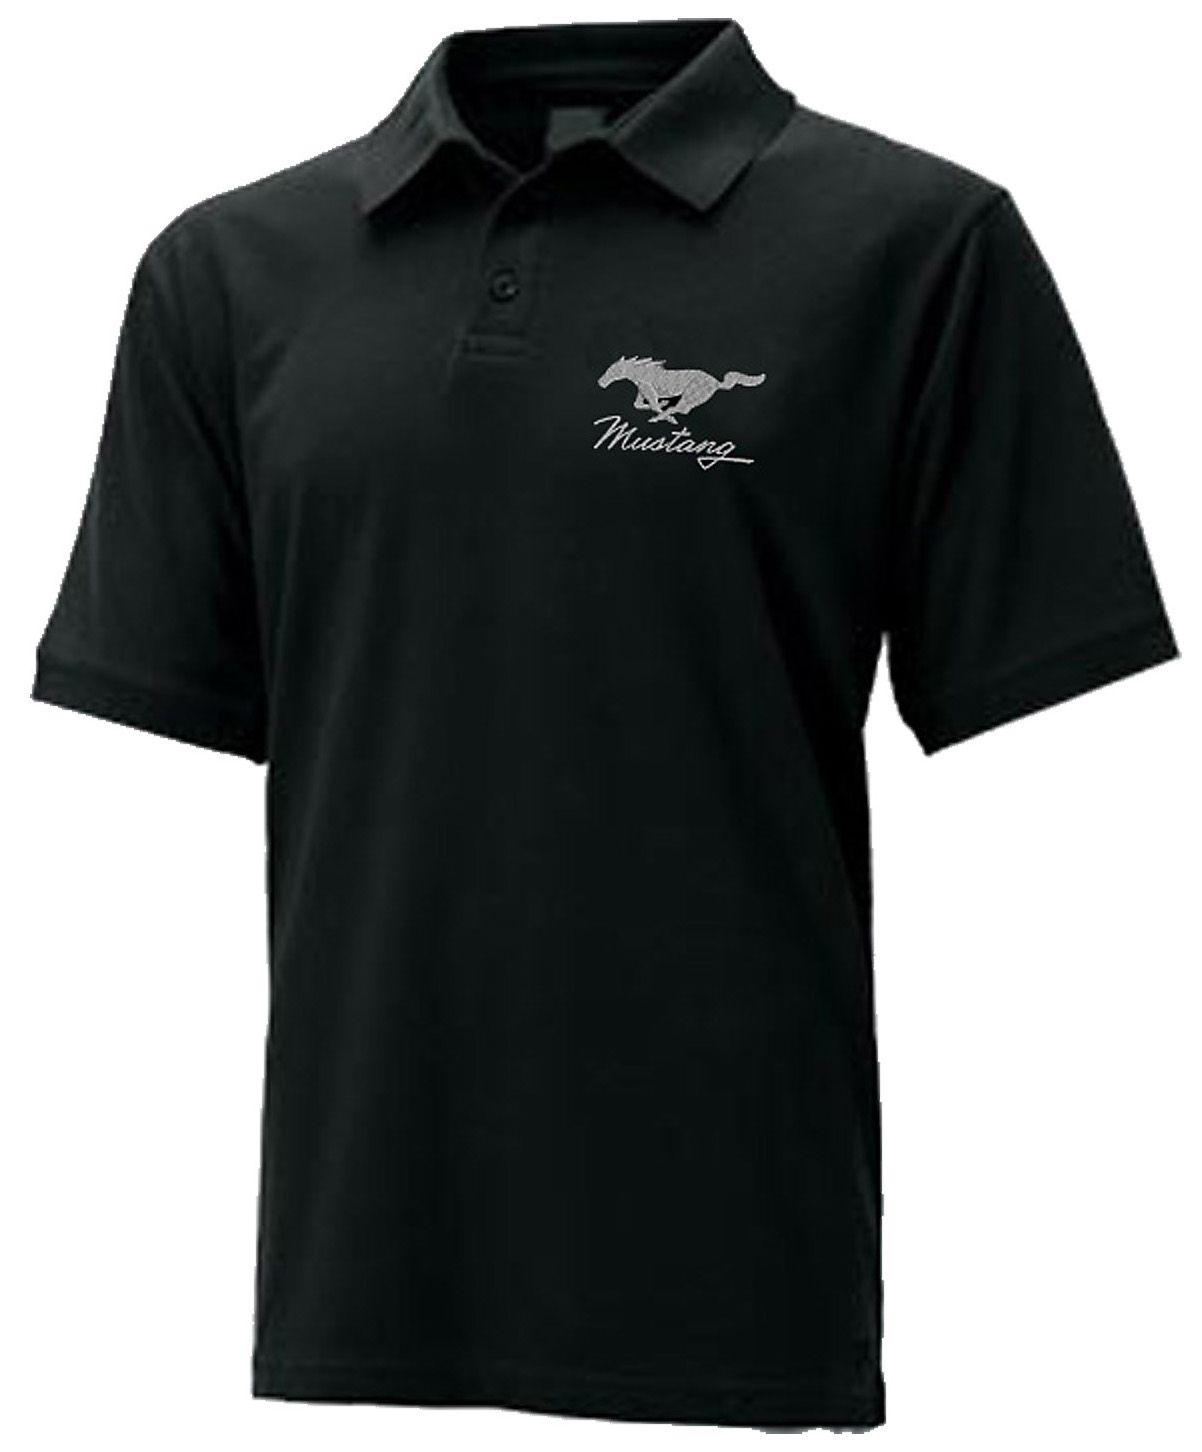 60% Freigabe Temperament Schuhe echte Qualität Ford Mustang Mens Polo Shirt | Ford Mustang Tee Shirts ...